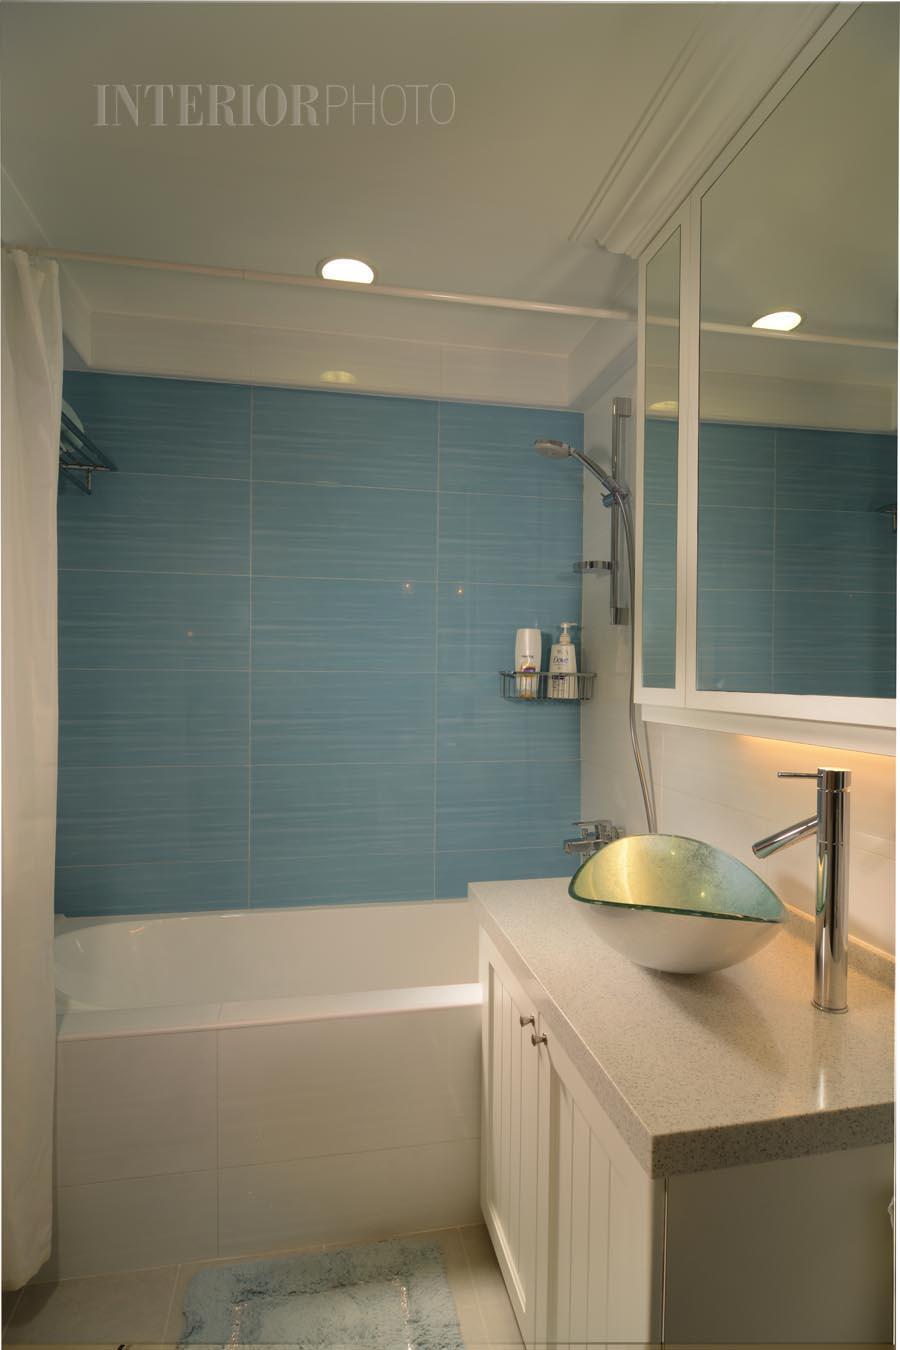 Aquarius by the park interiorphoto professional for Small bathroom design singapore